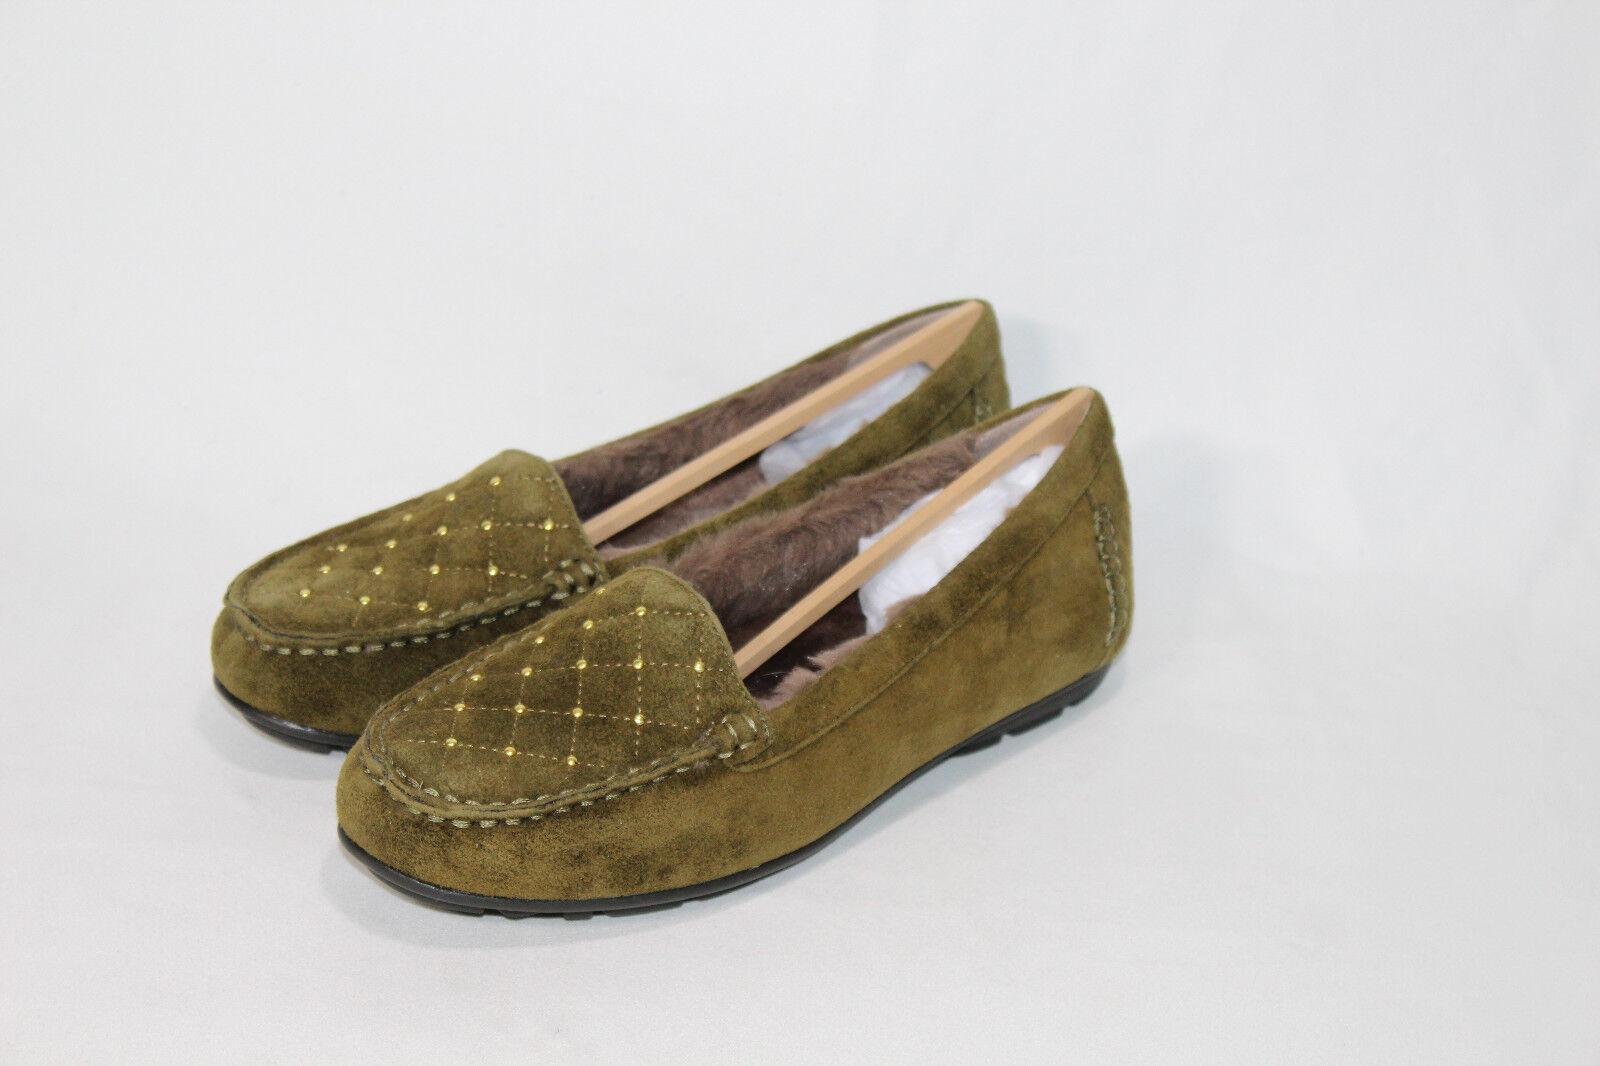 Naturalizer slip on fur moccasins shoes pice size color new